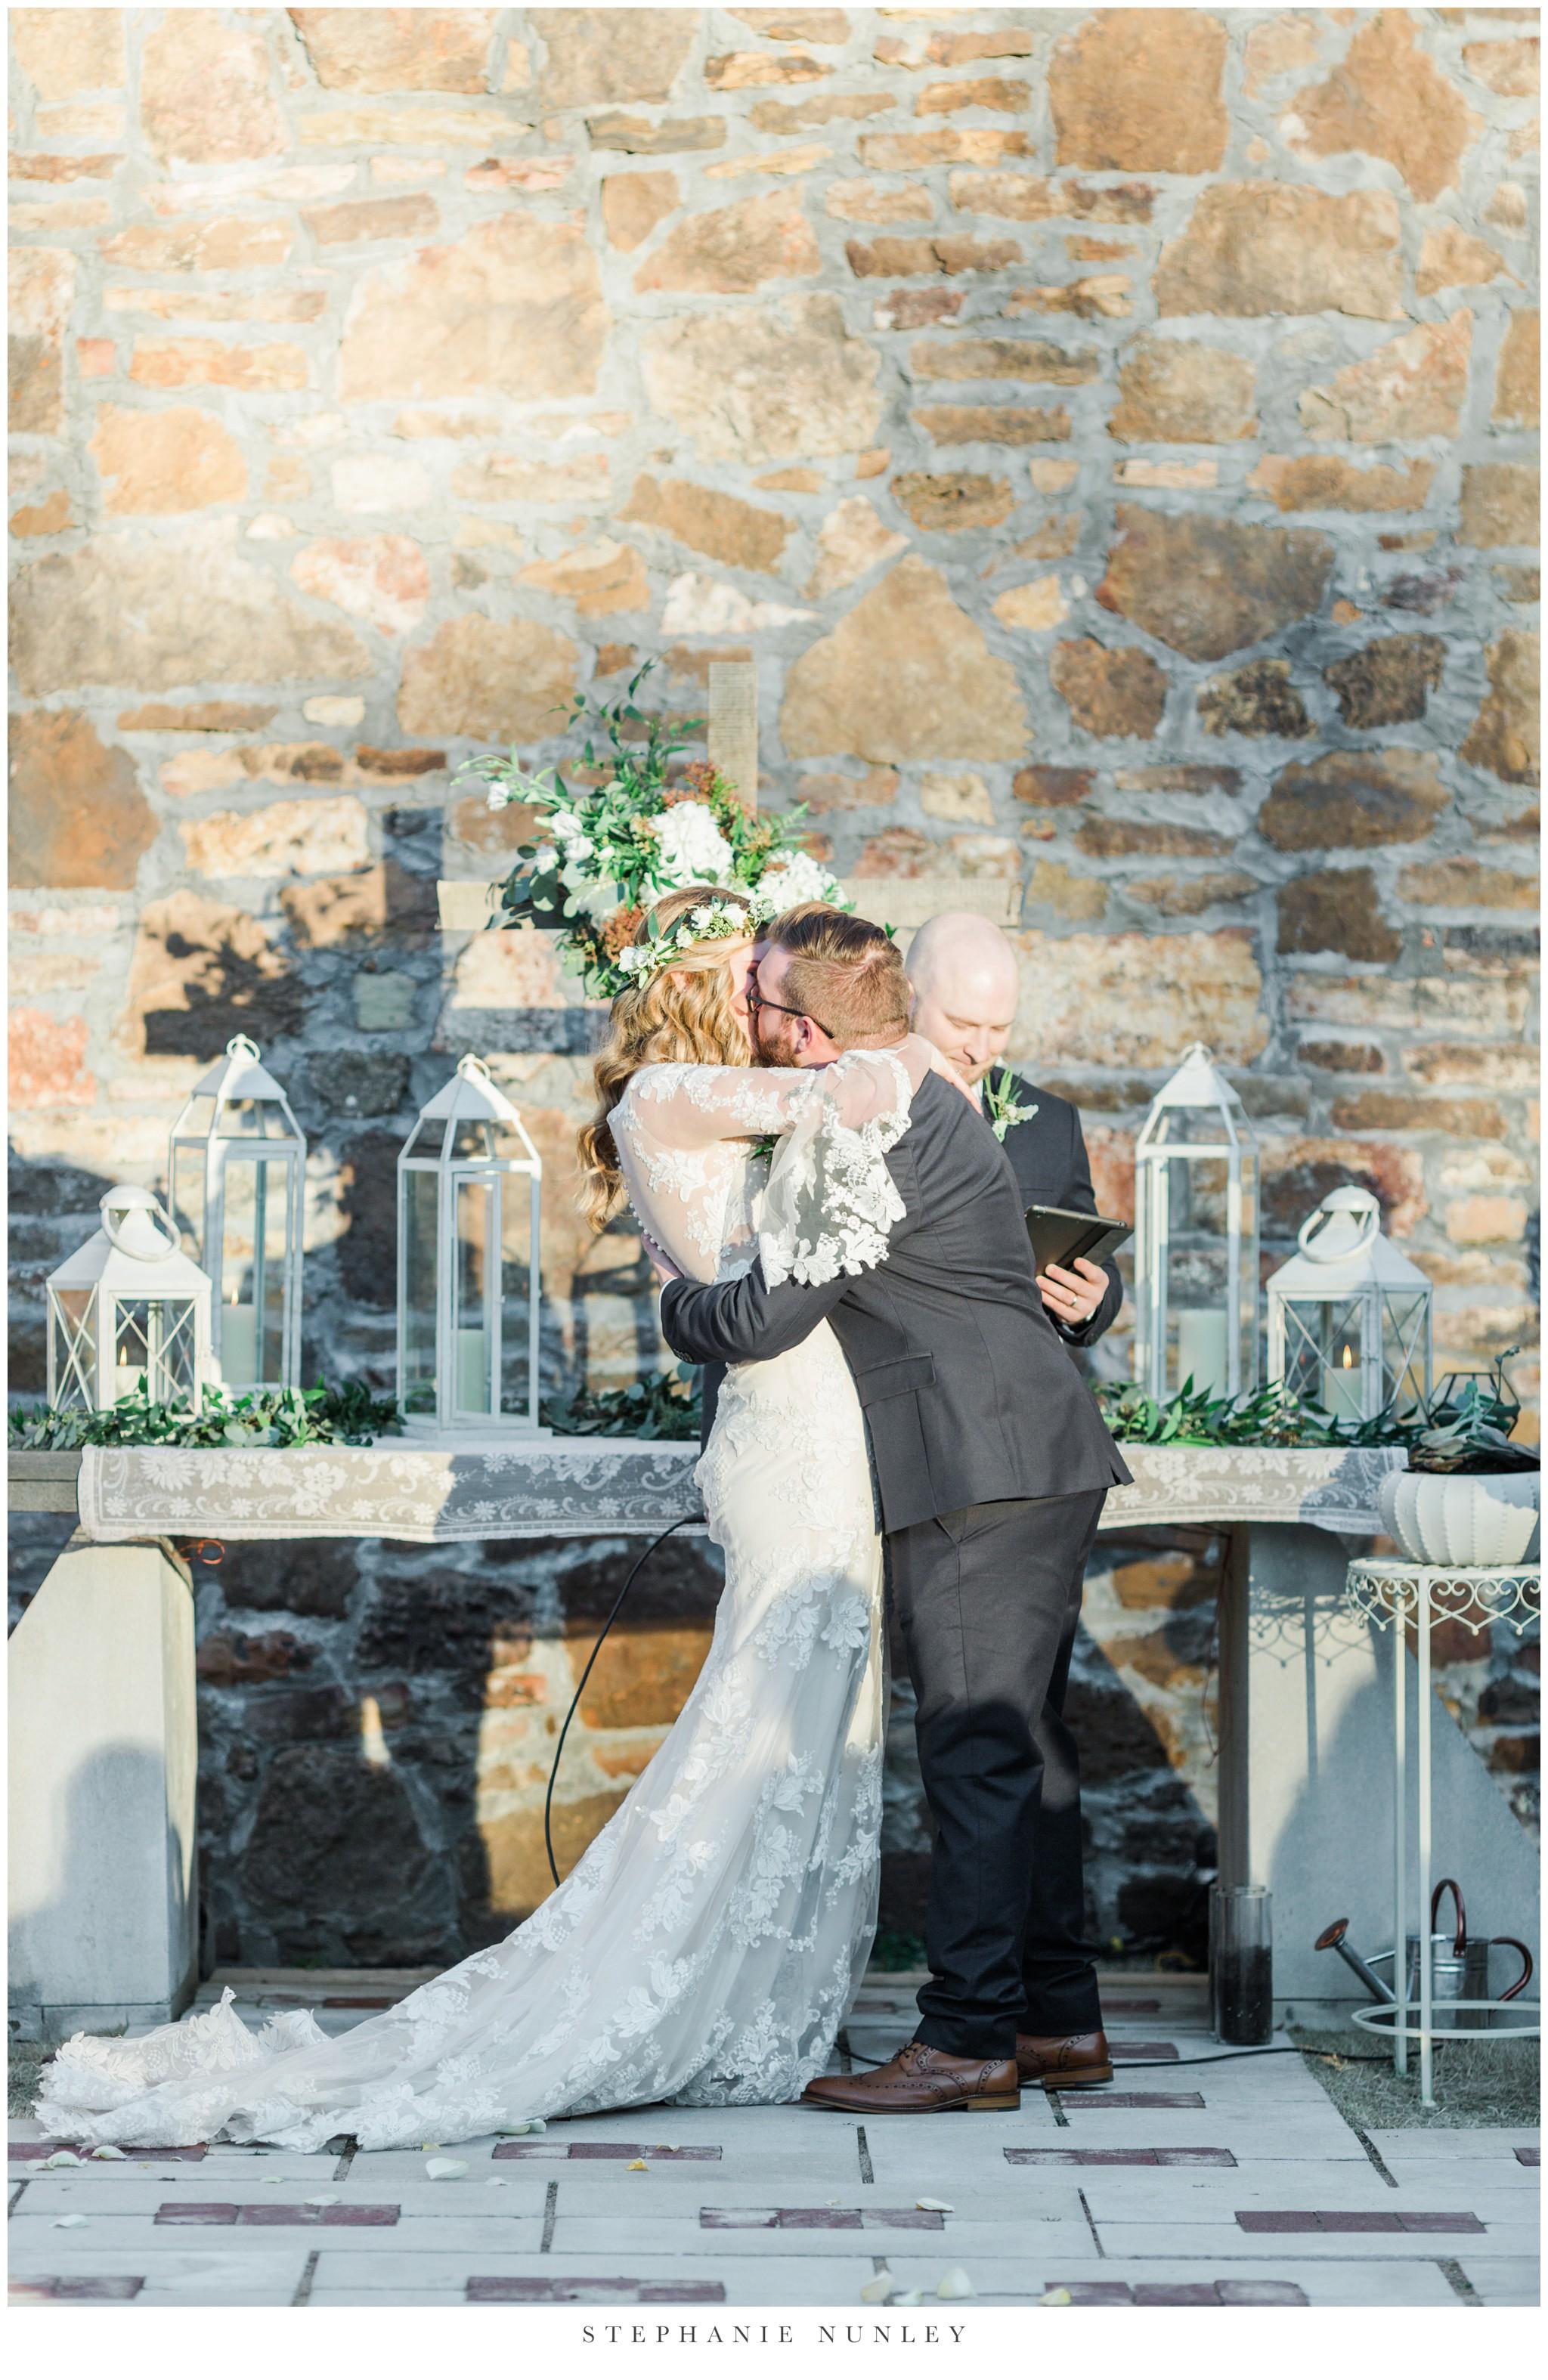 sassafrass-springs-vineyard-film-wedding-photos-63.jpg